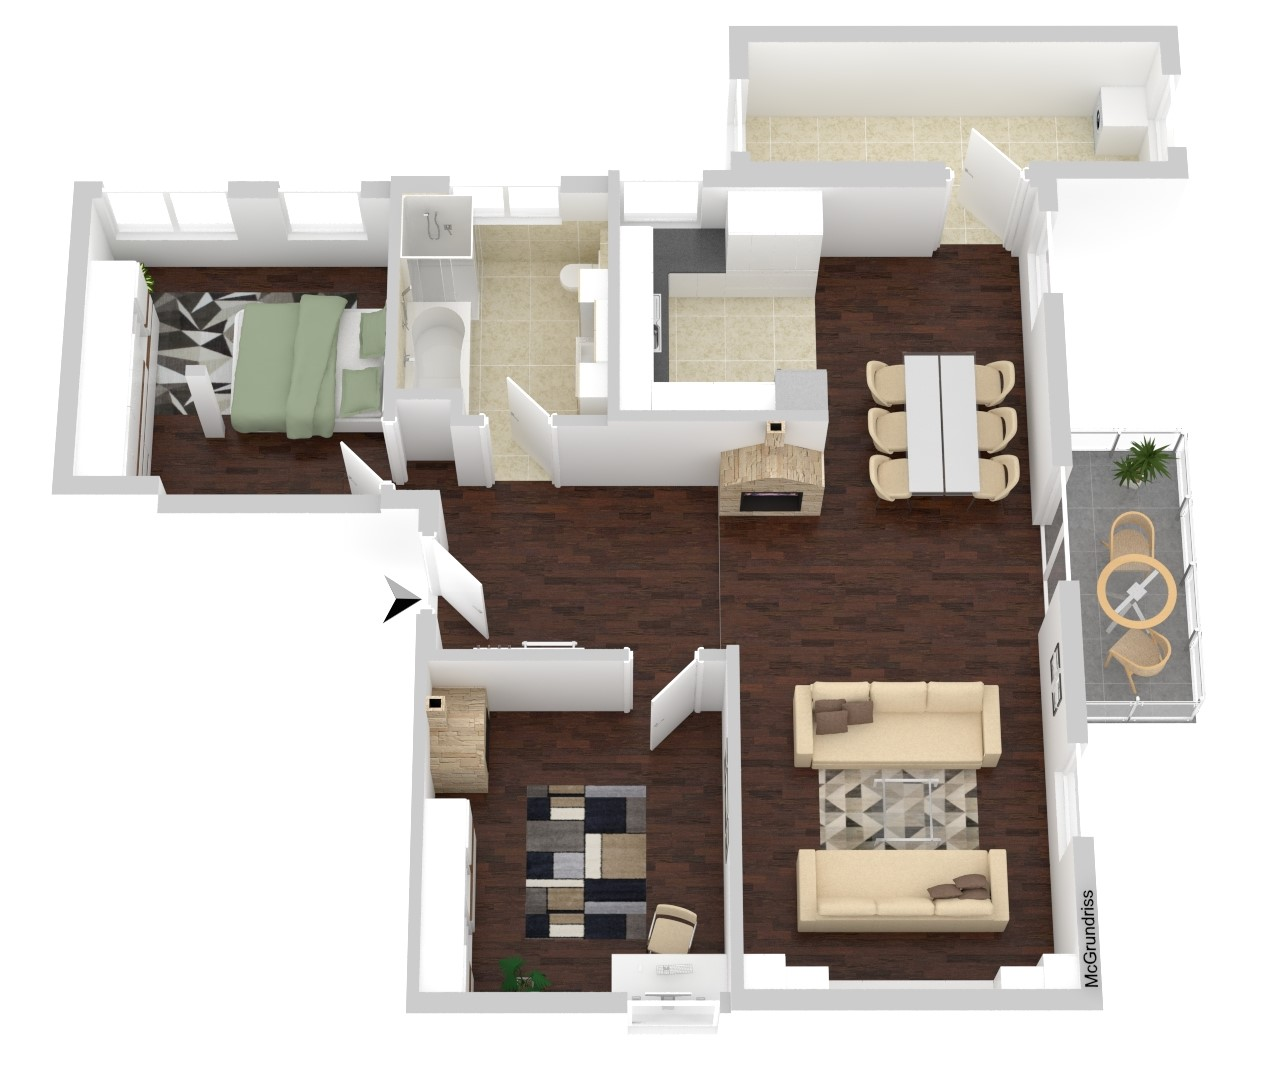 Wohnung Nr. 5 (109,87 m²)